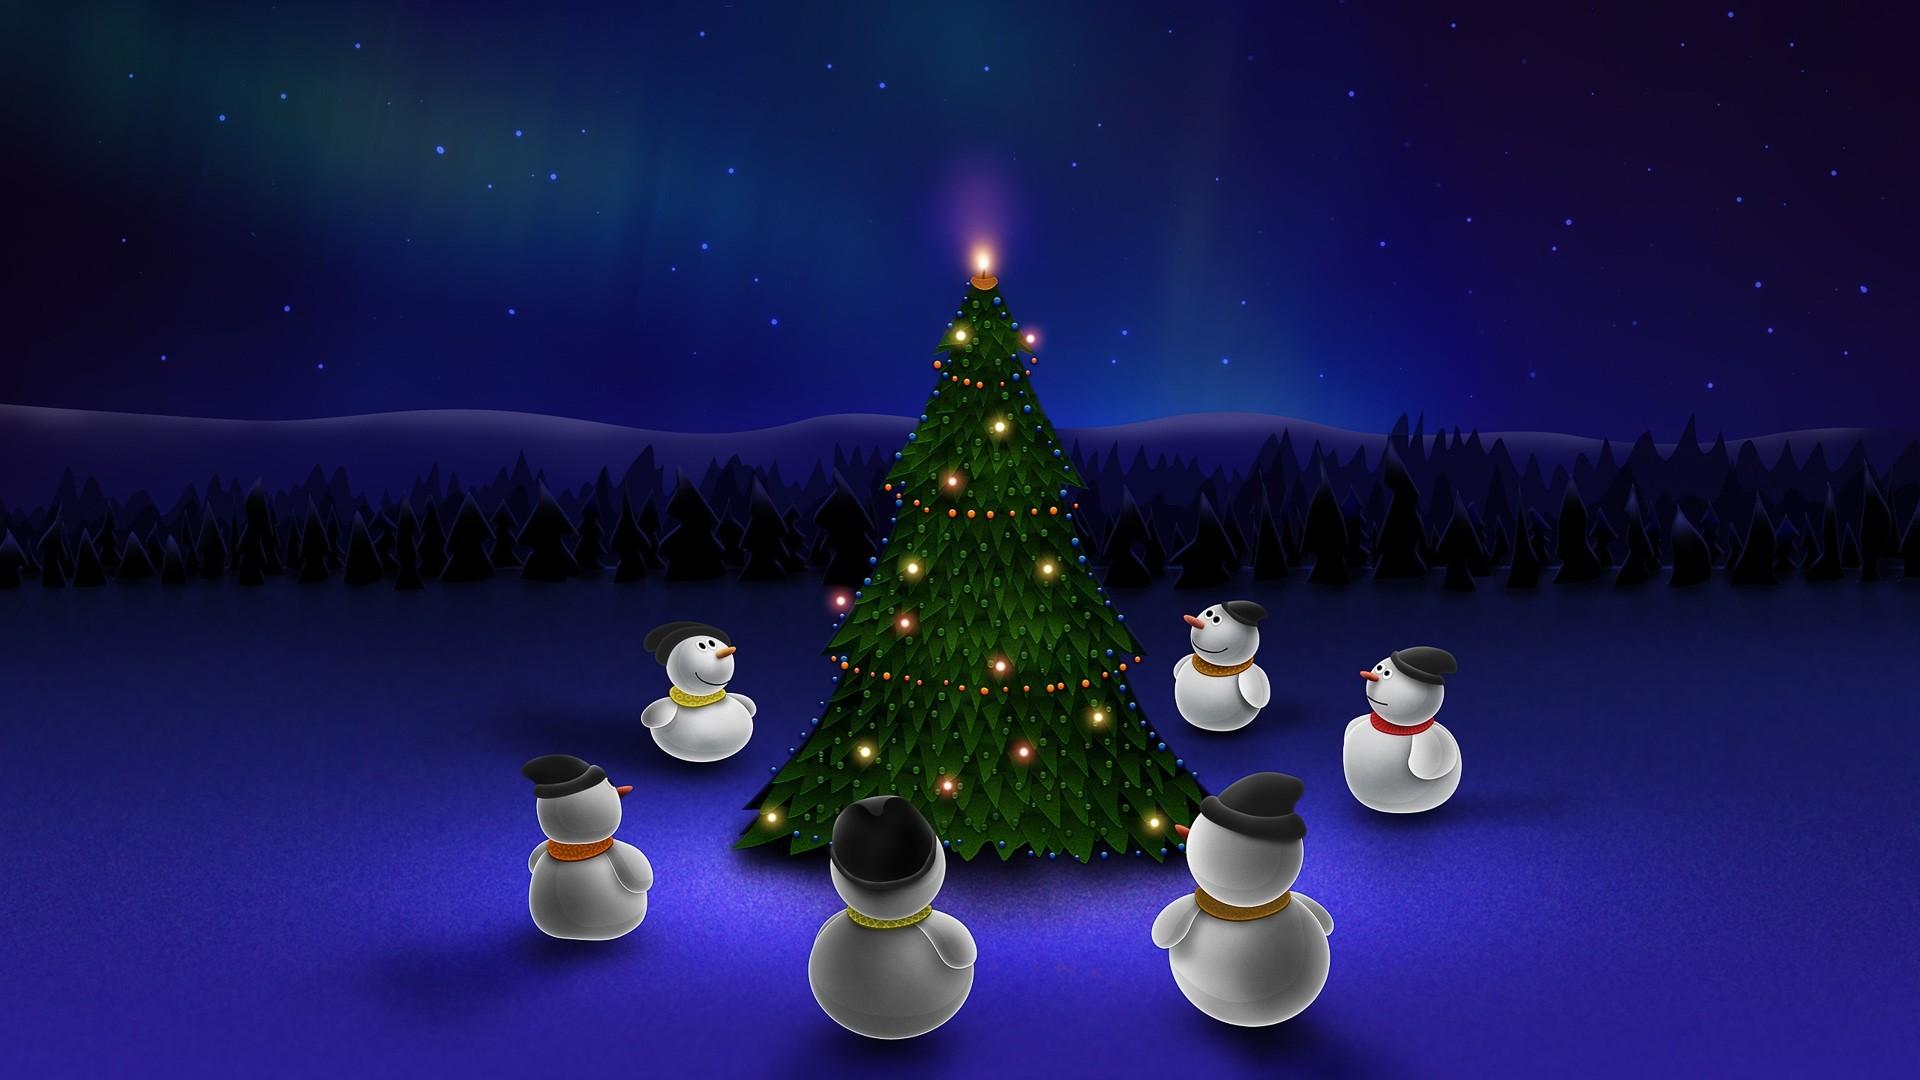 Wallpaper new year, snowman, christmas tree, holiday